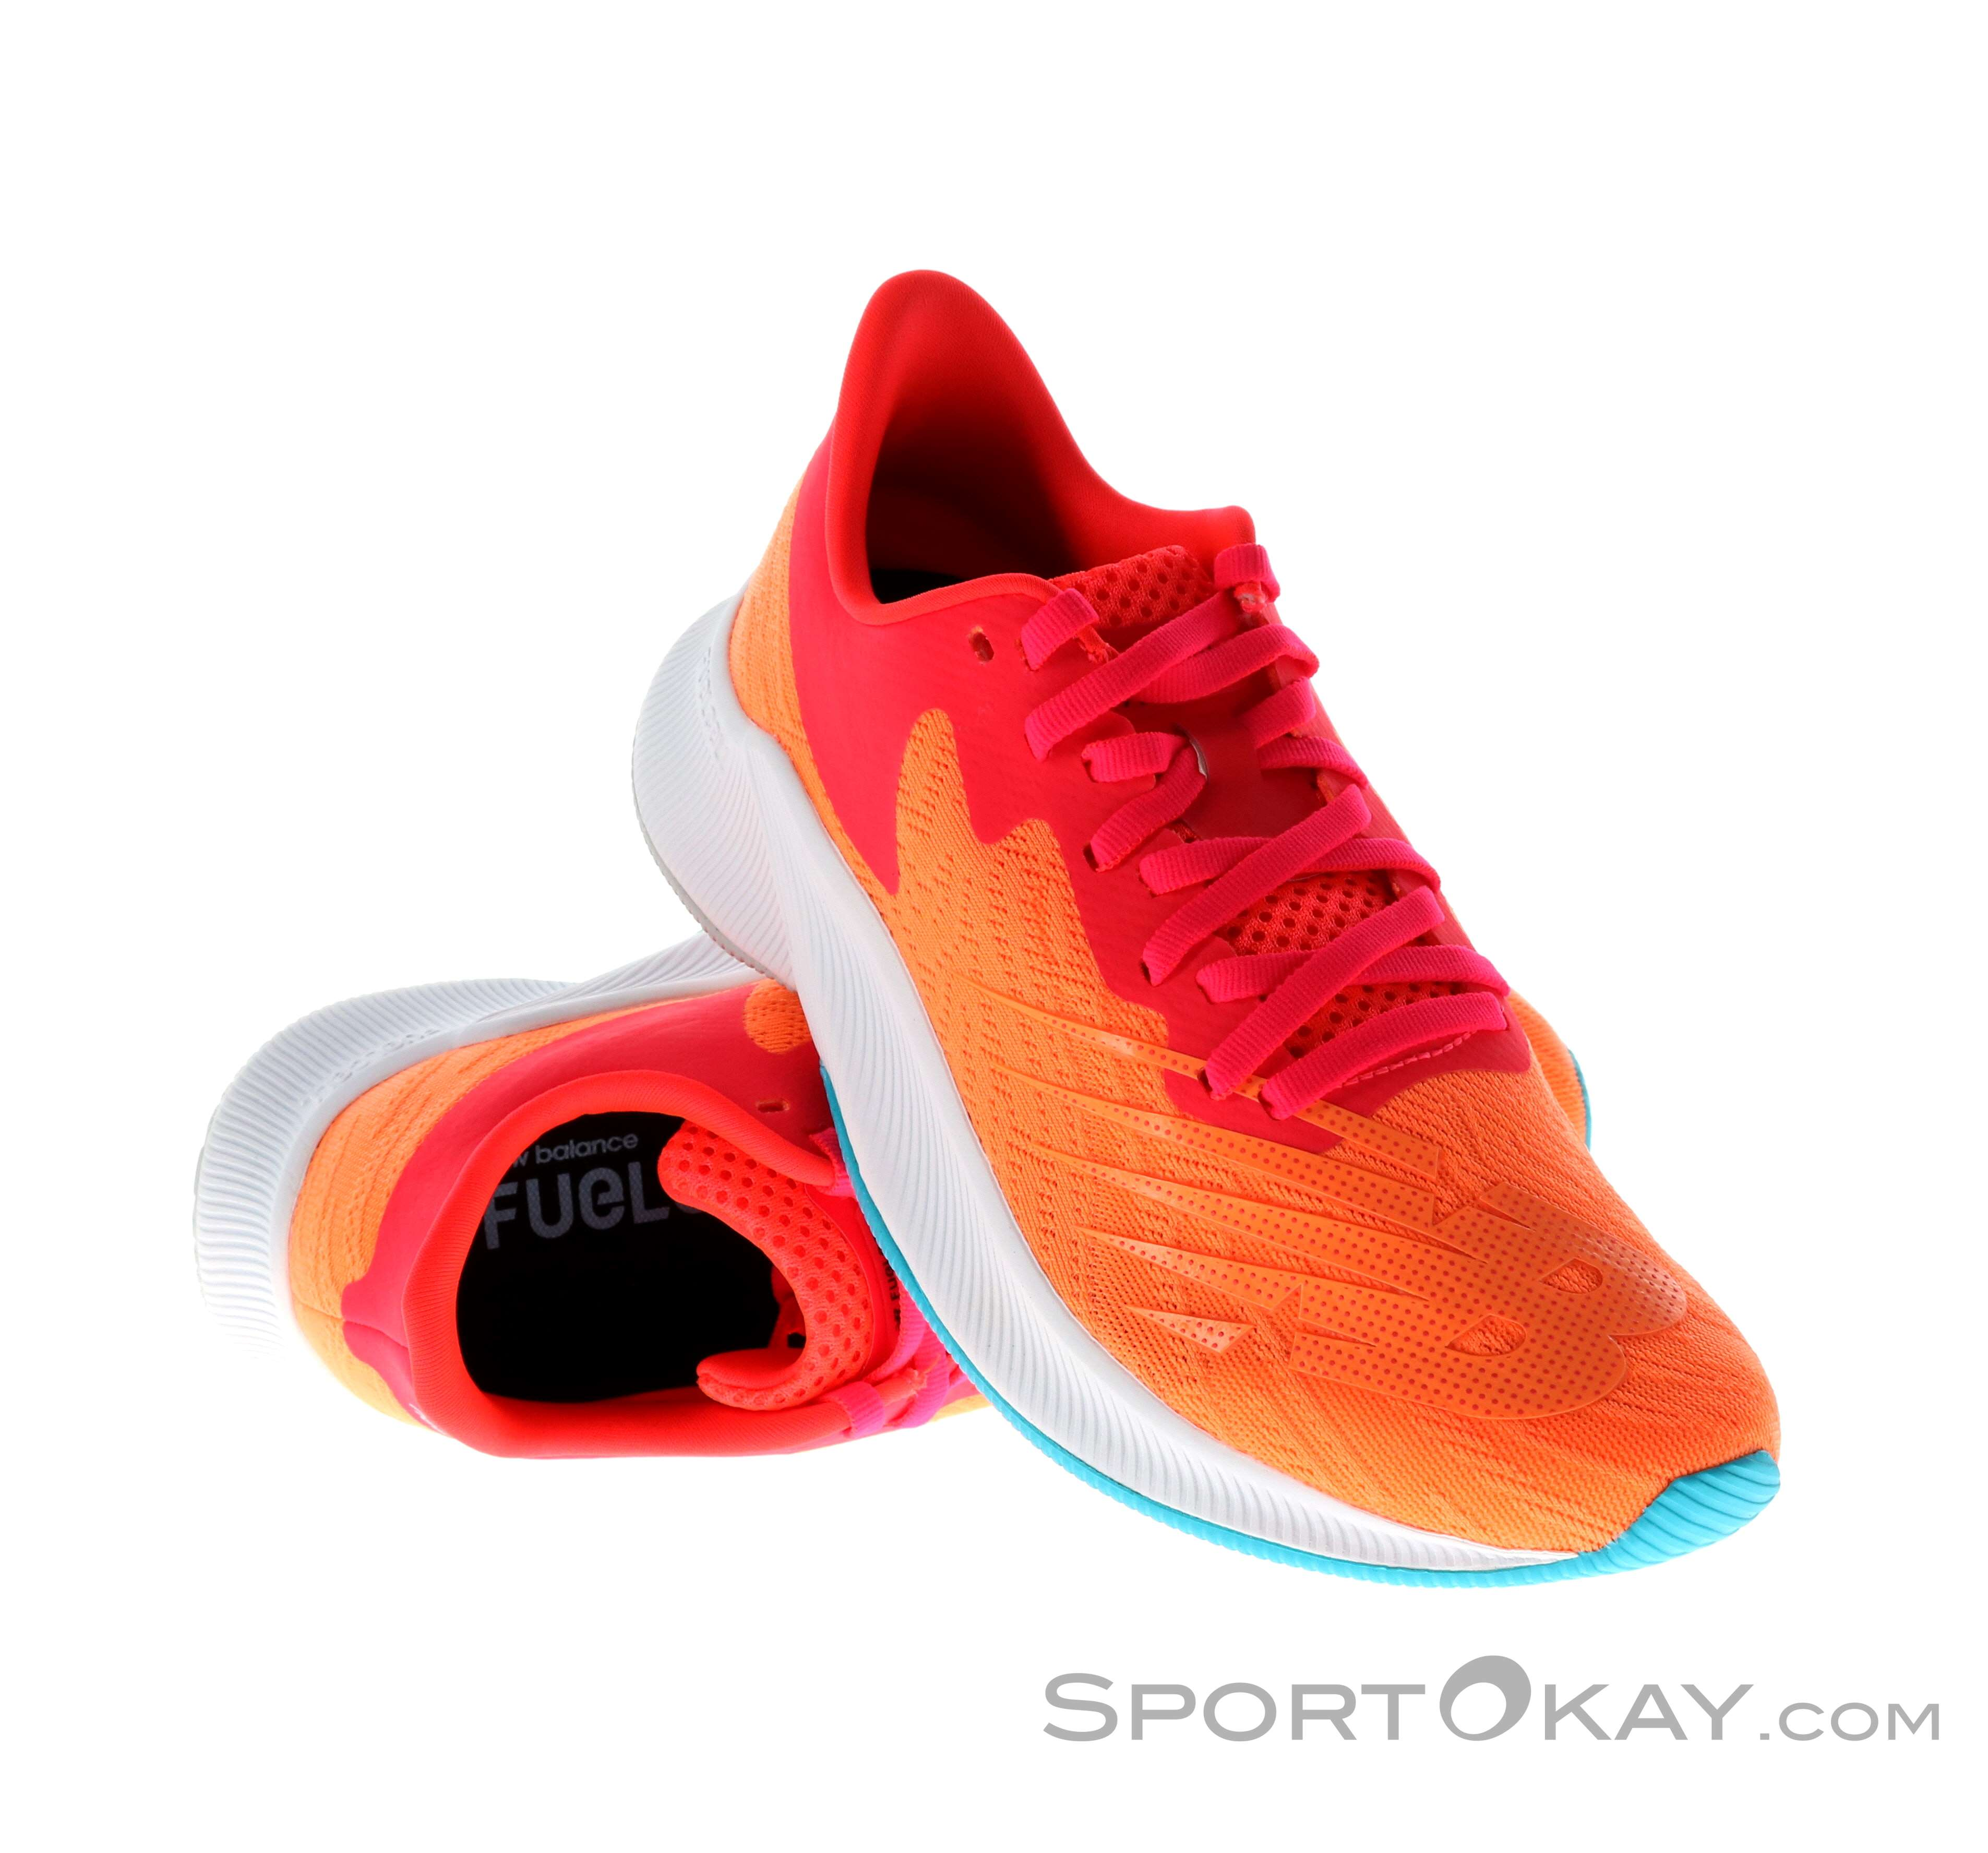 New Balance New Balance 500 Sneaker Mens Running Shoes